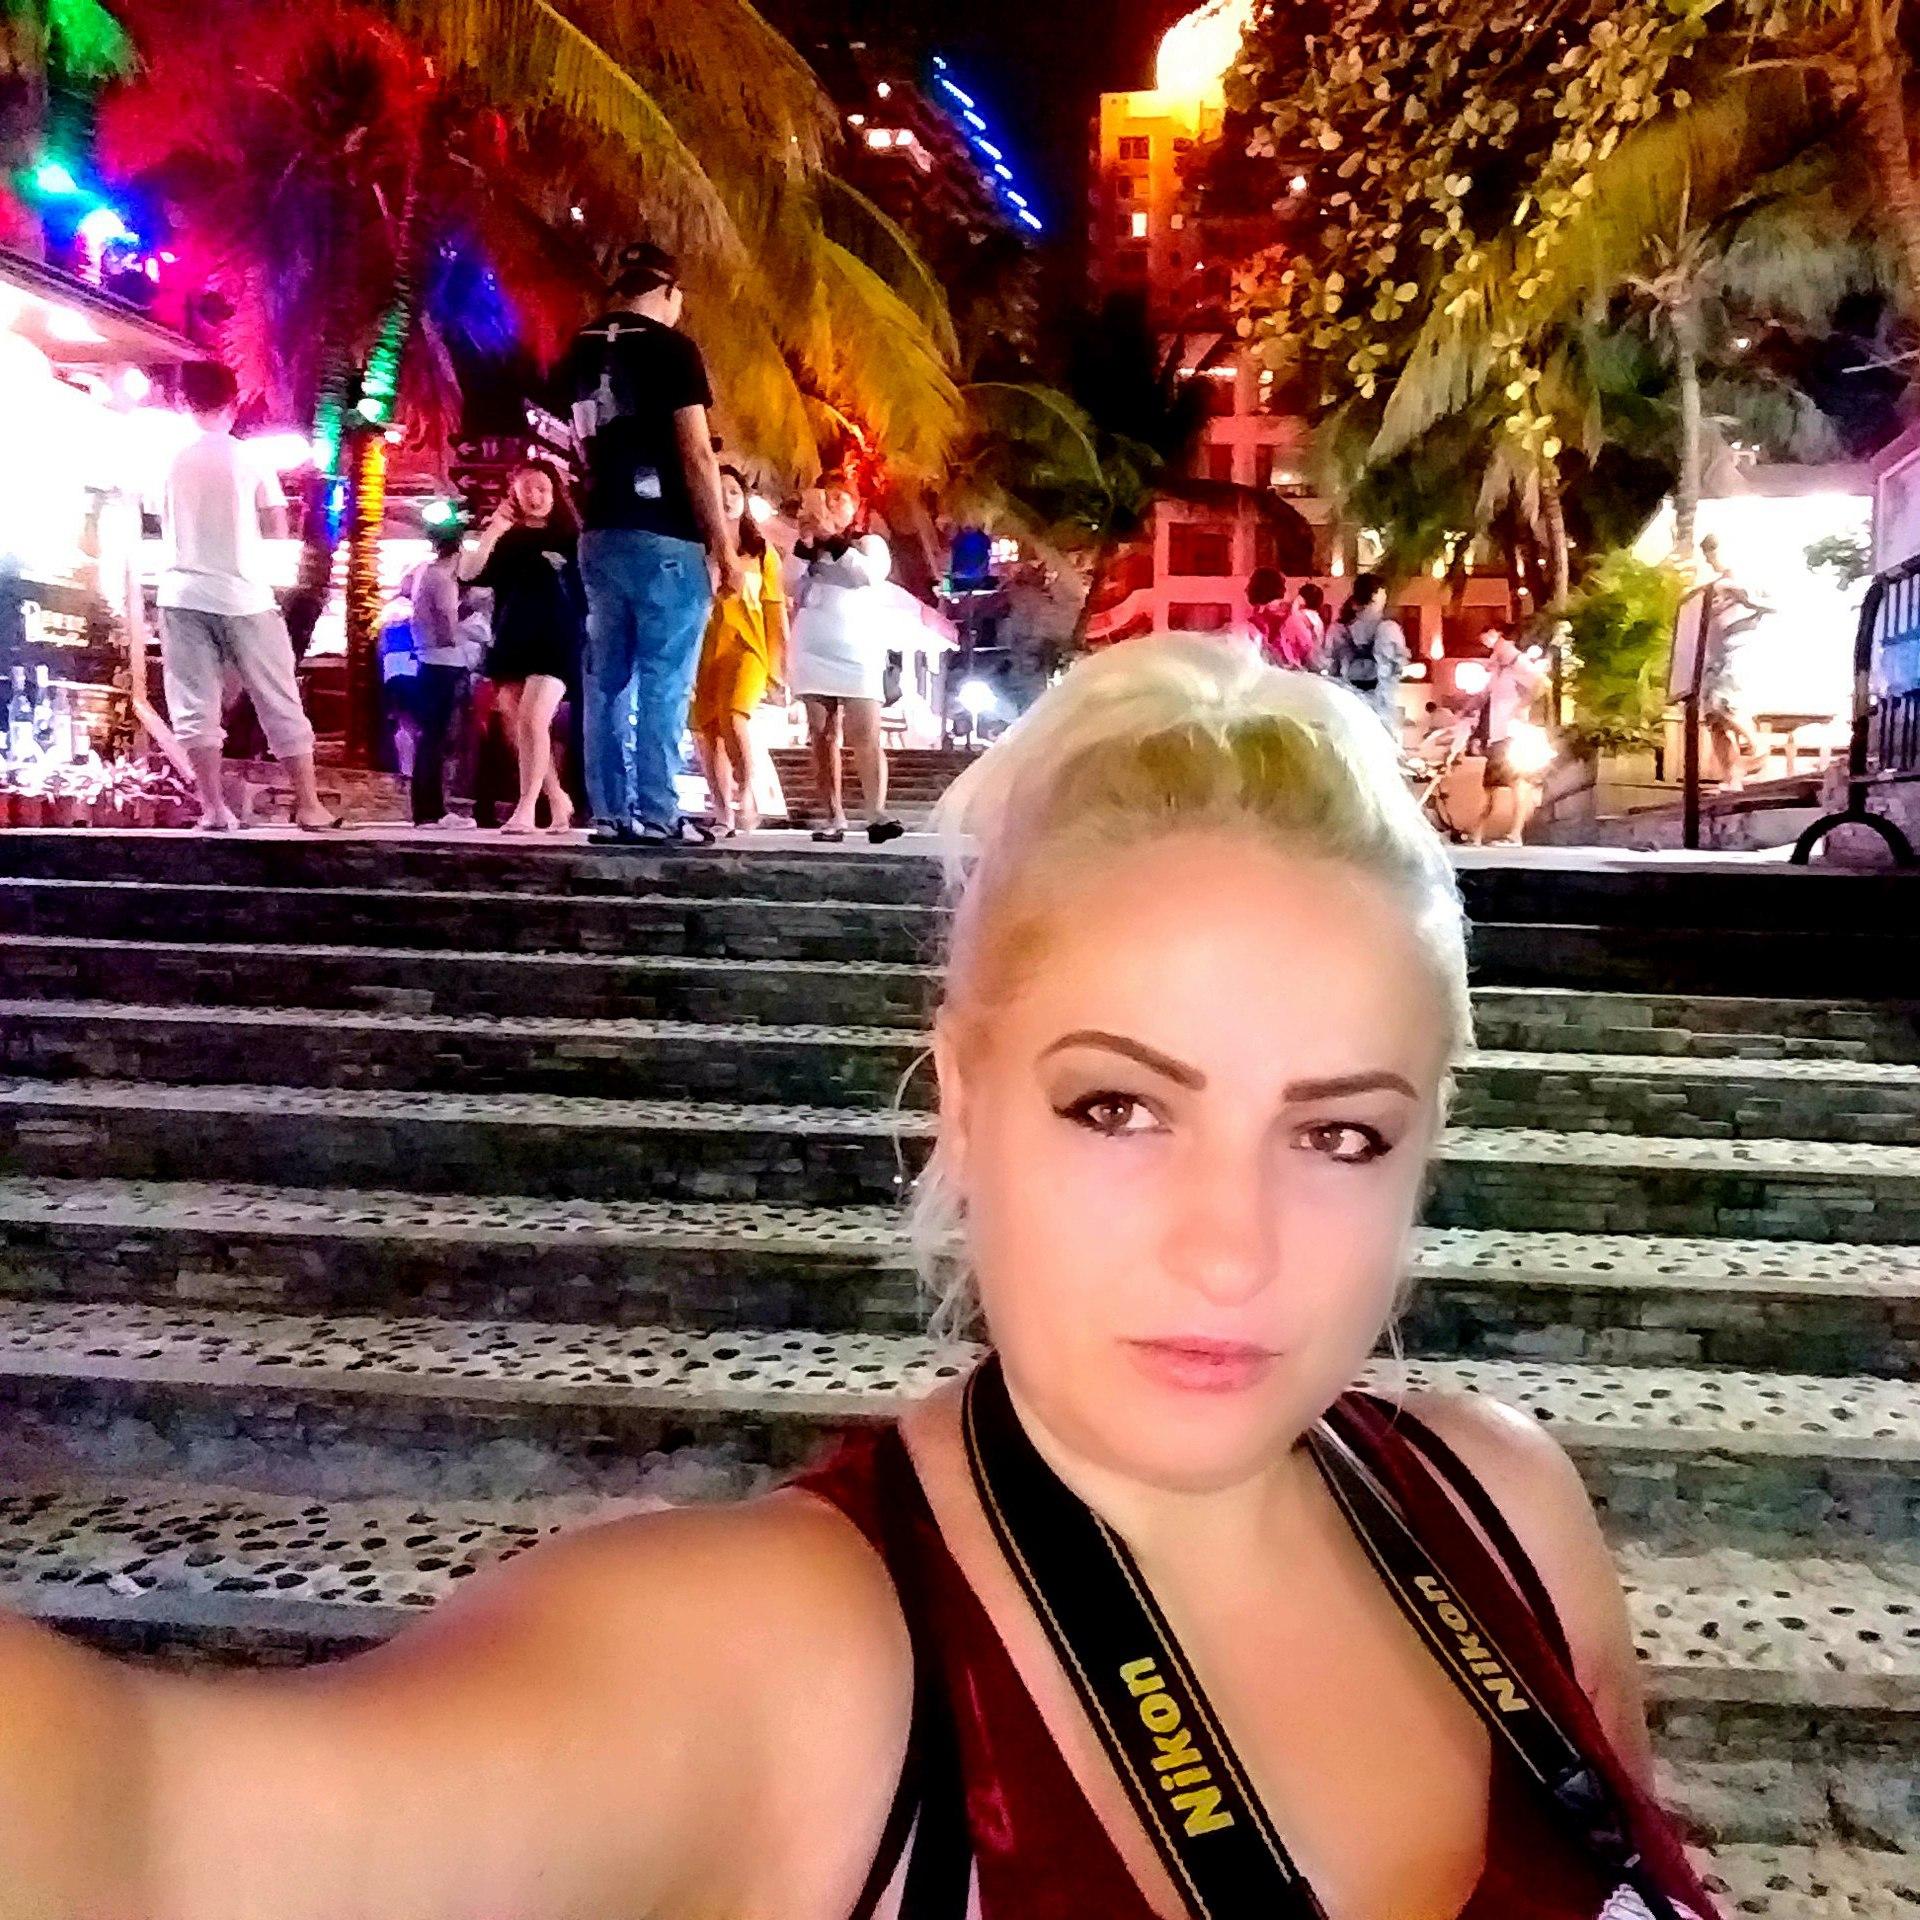 Хештег девушка на   Салон Магии и Мистики Елены Руденко. Киев ,тел: +380506251562 0onqGY2jCEM